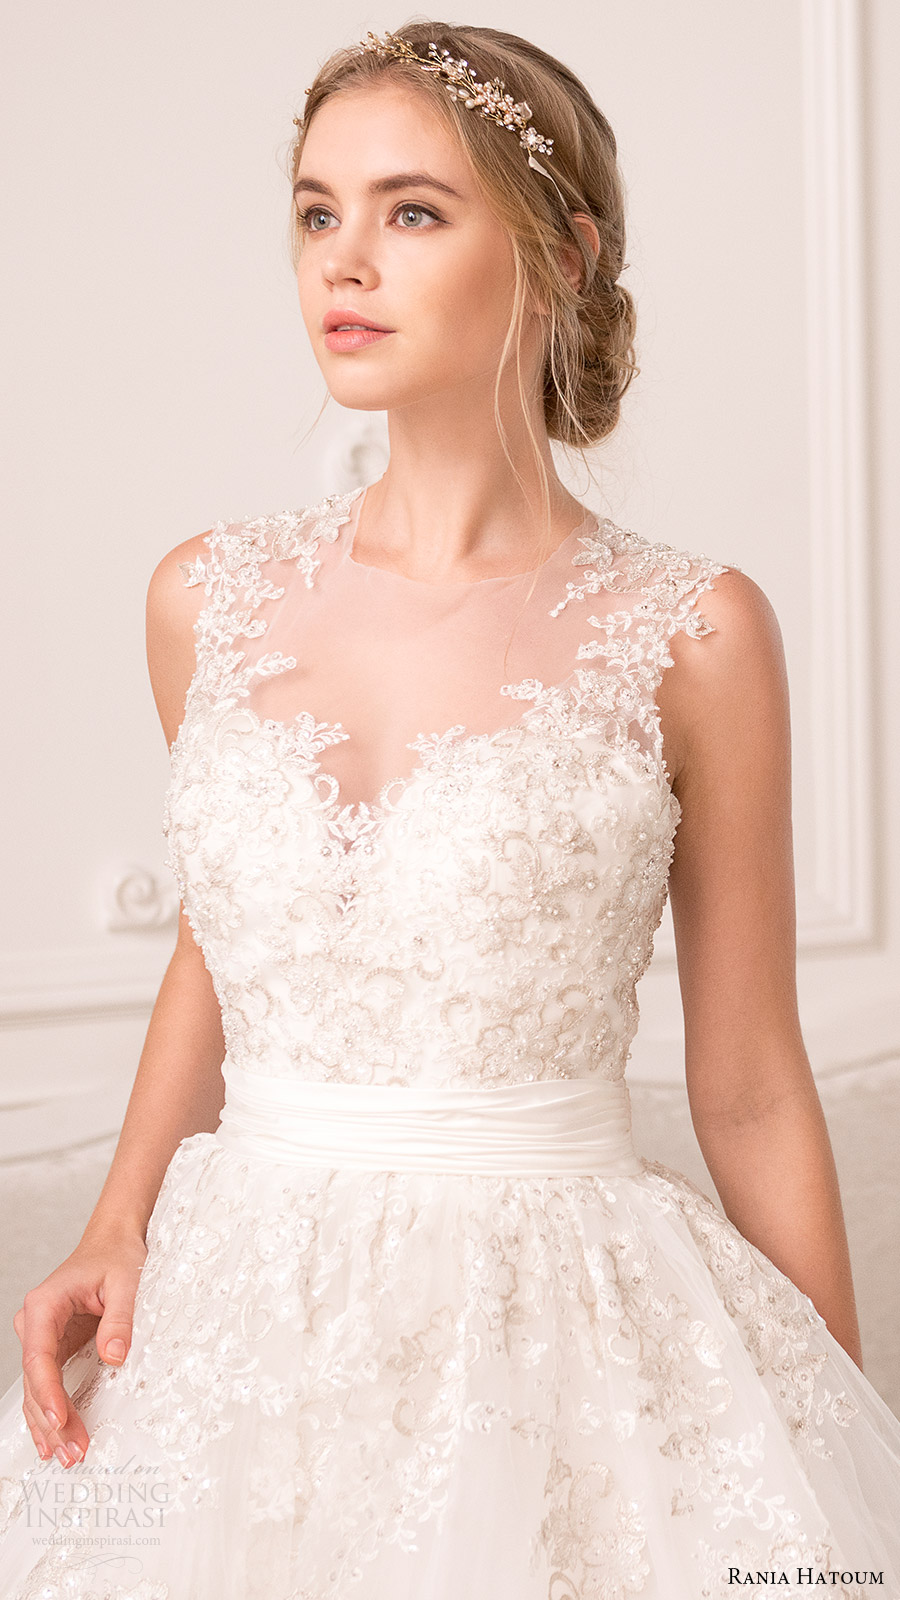 rania hatoum bridal spring 2017 sleeveless illusion jewel neck ball gown wedding dress (hazel) zfv beaded bodice